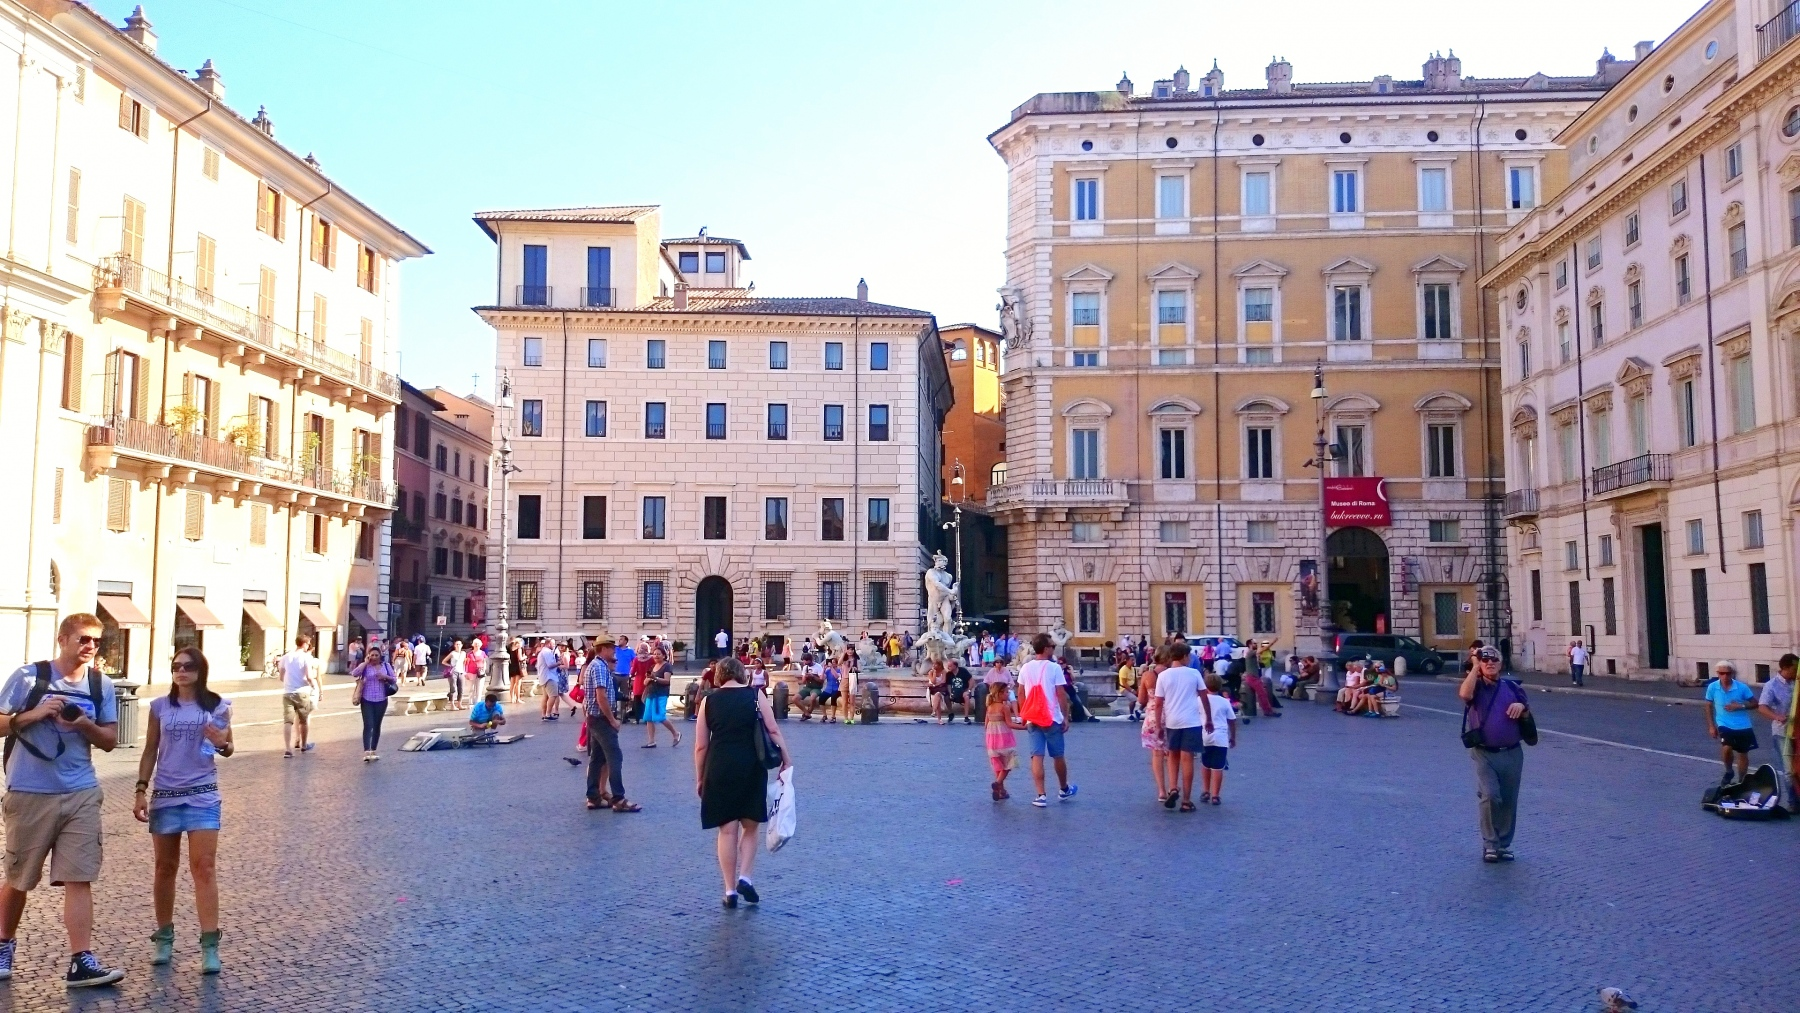 Piazza Navona 67